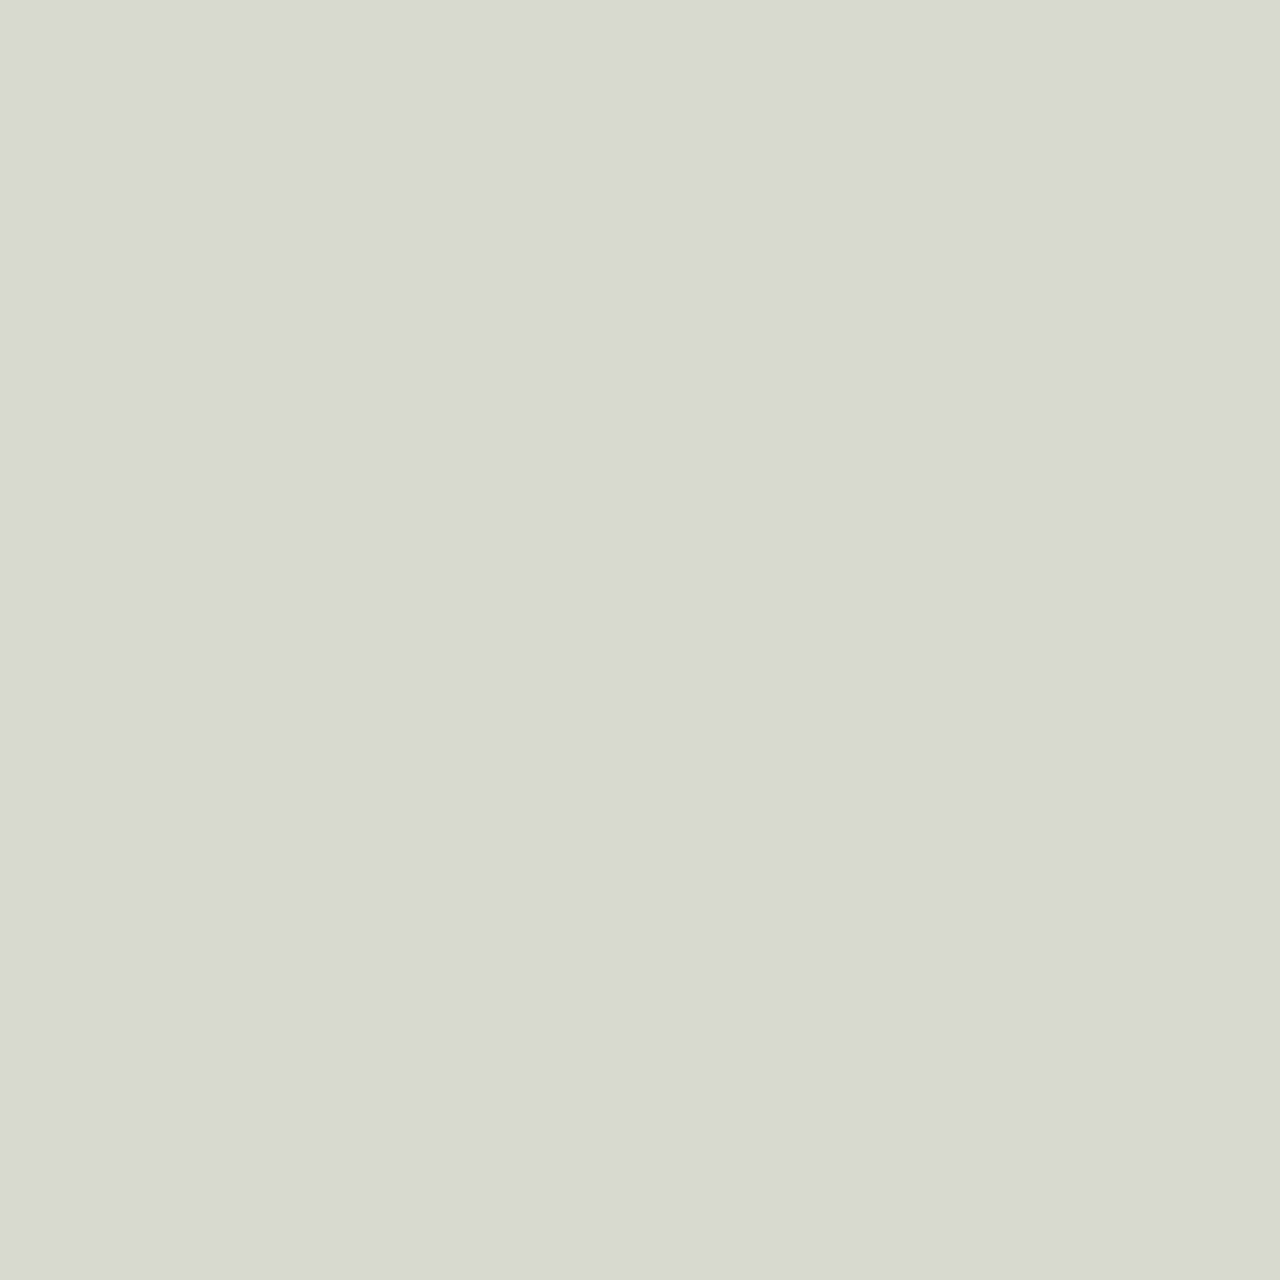 T03.1.0 Pastel Grey